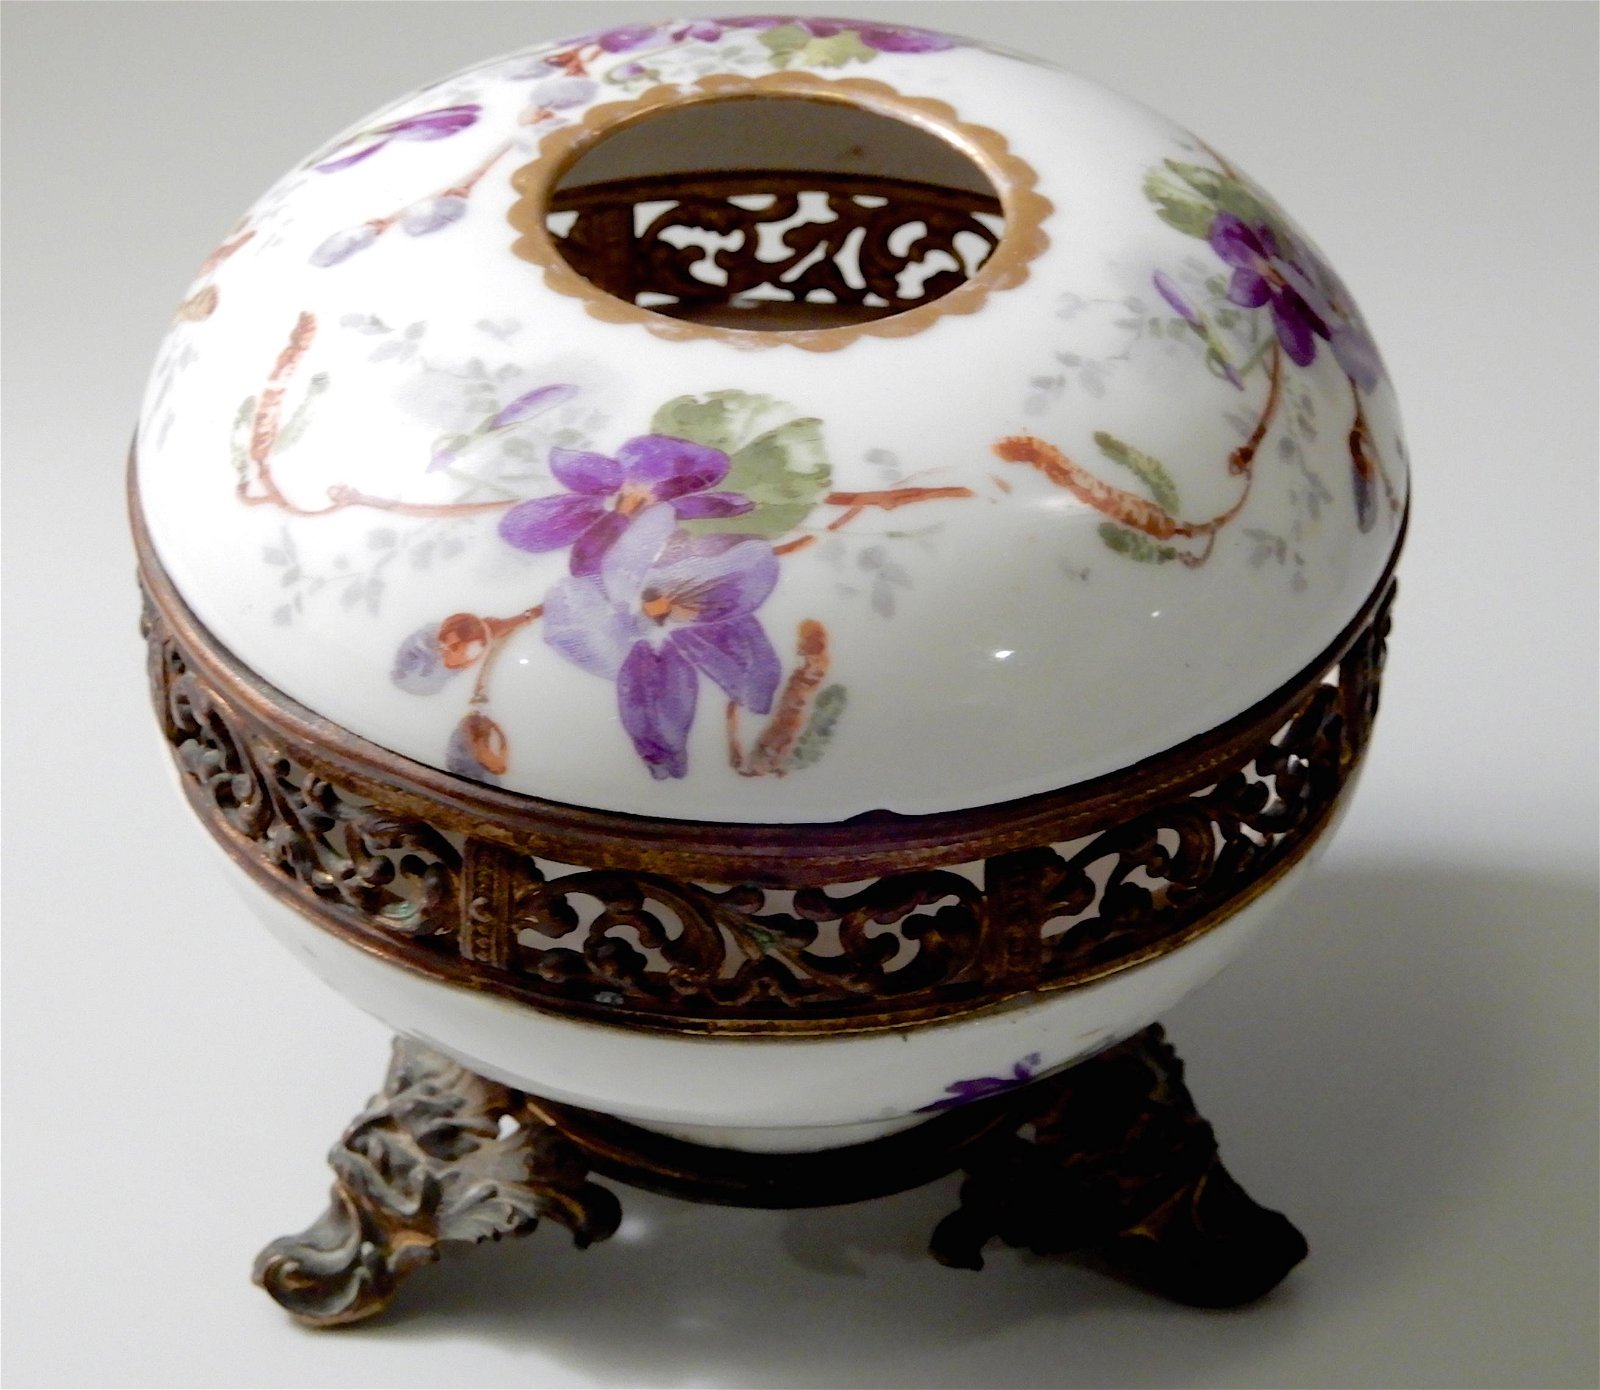 WG & Cie French Limoges Ormolu Mounted Porcelain Vanity